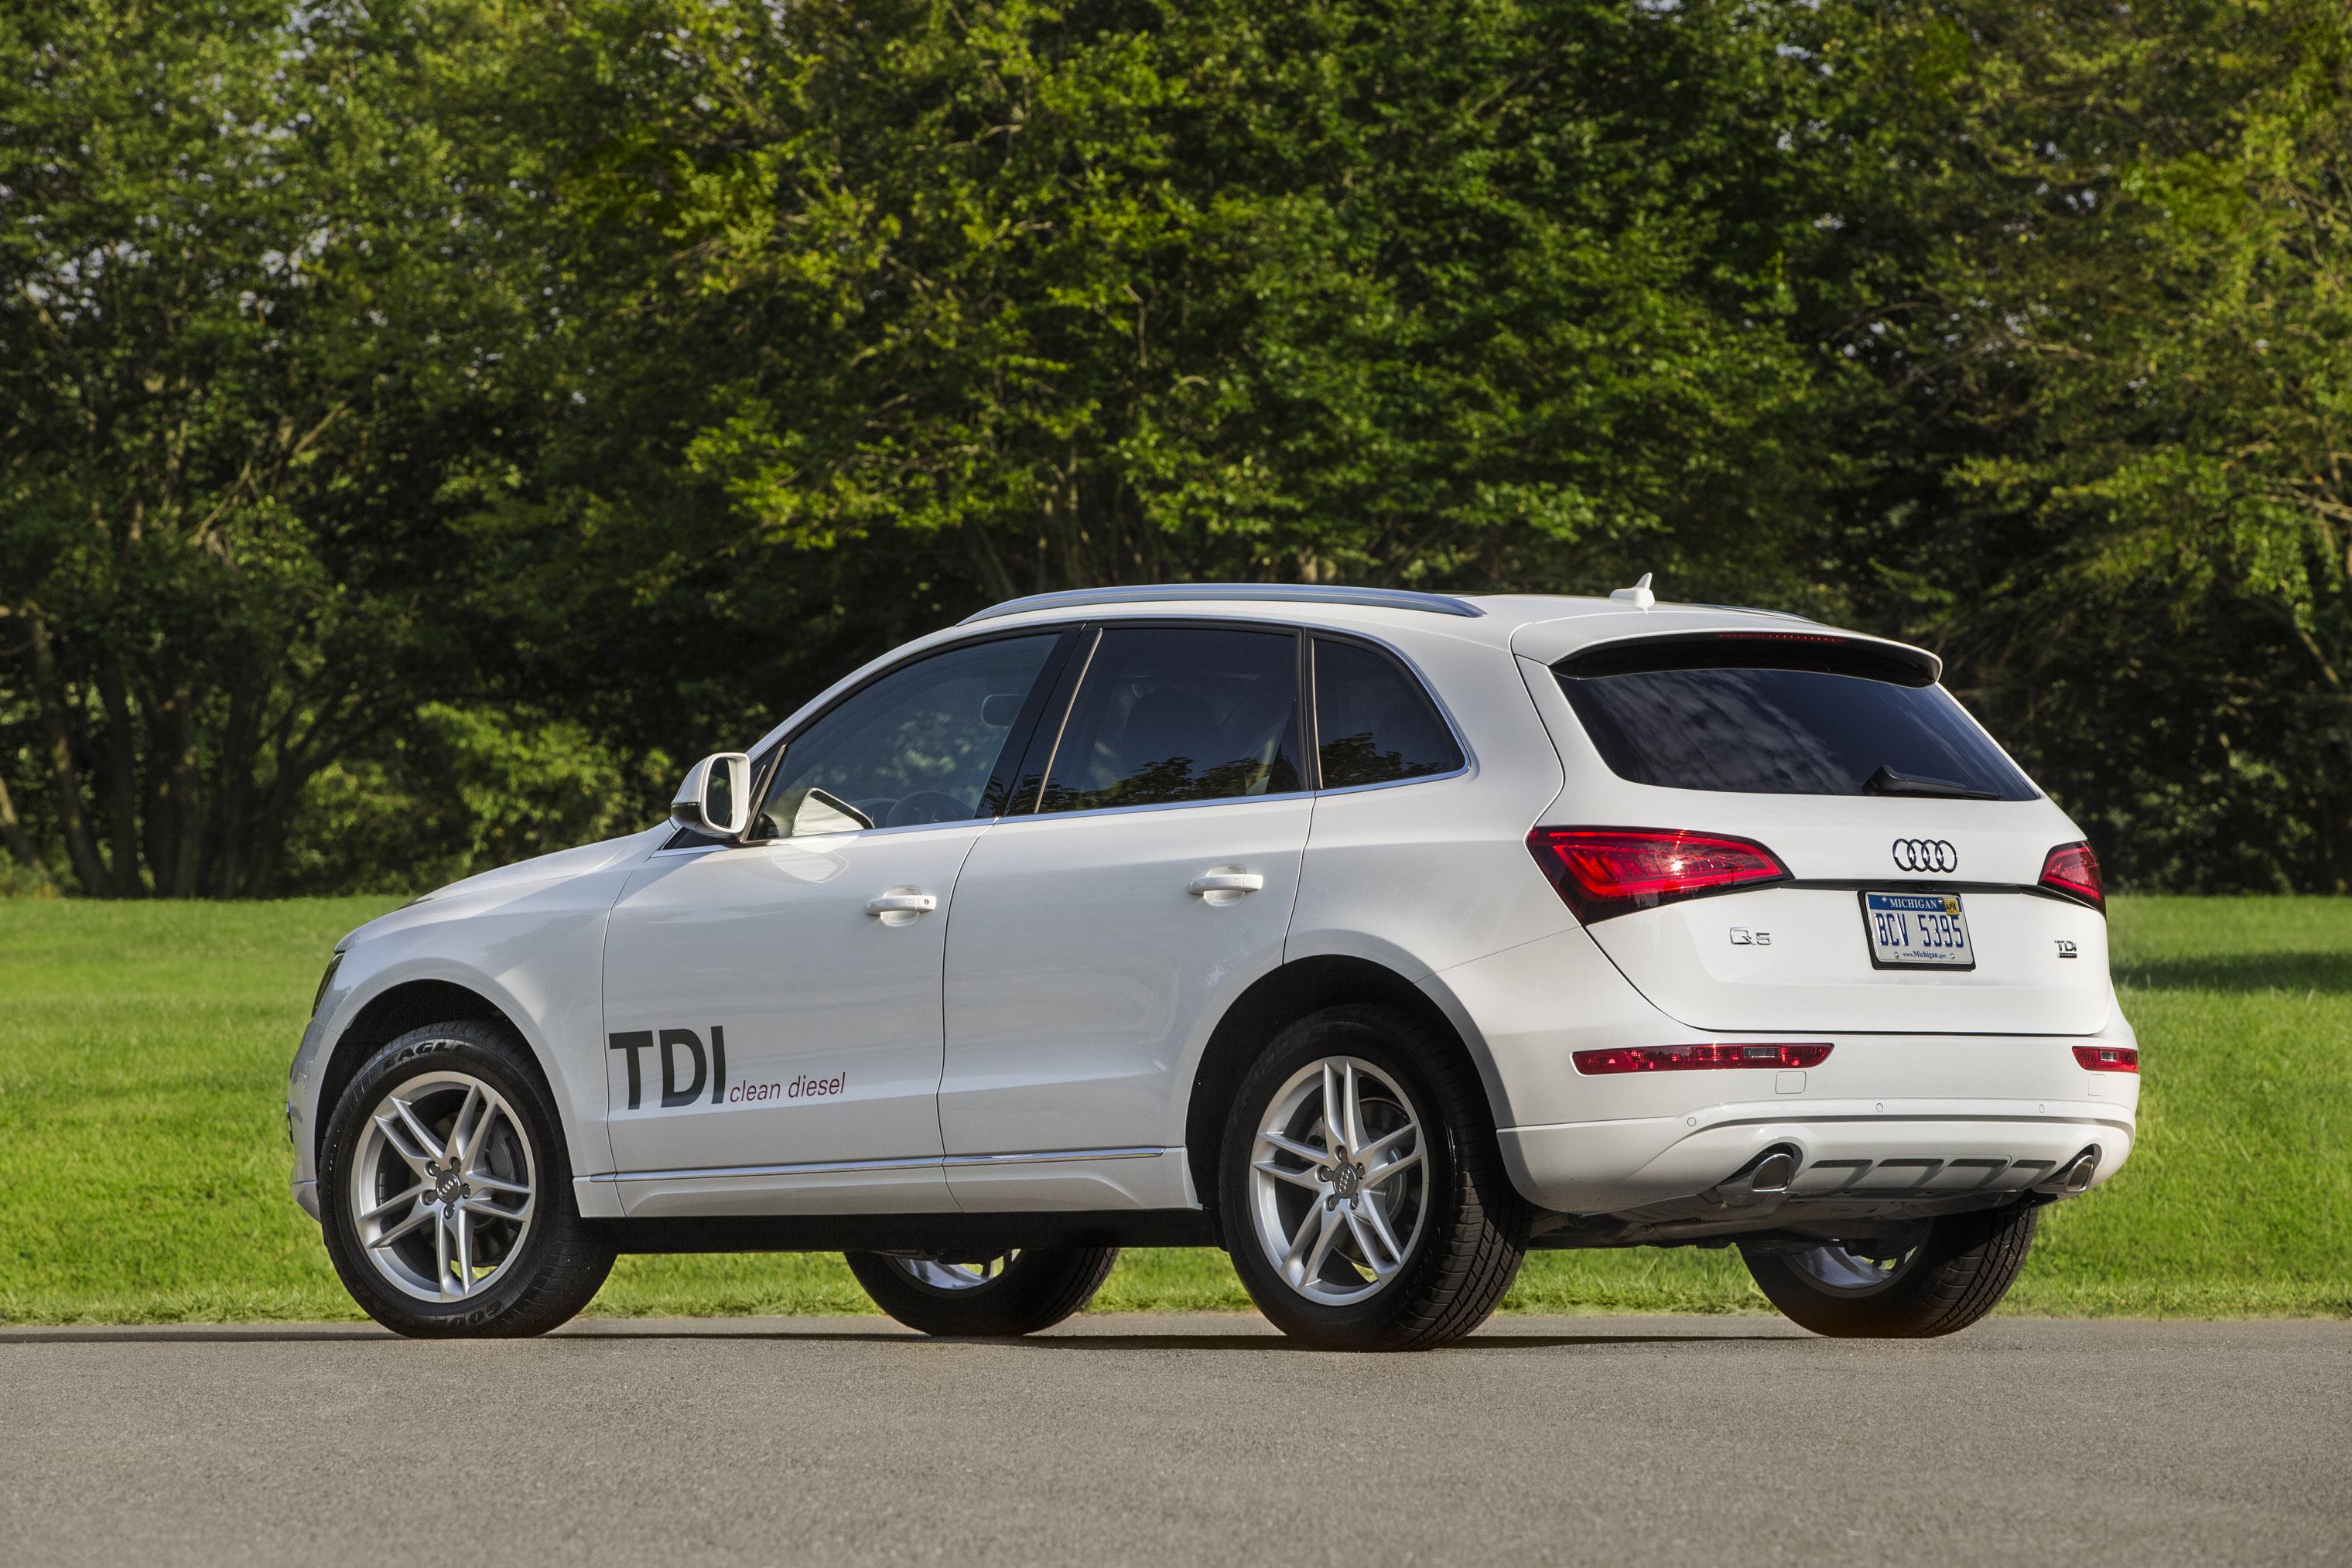 2014 Audi Q5 Tdi Best Luxury Compact Suv Latest Audi News